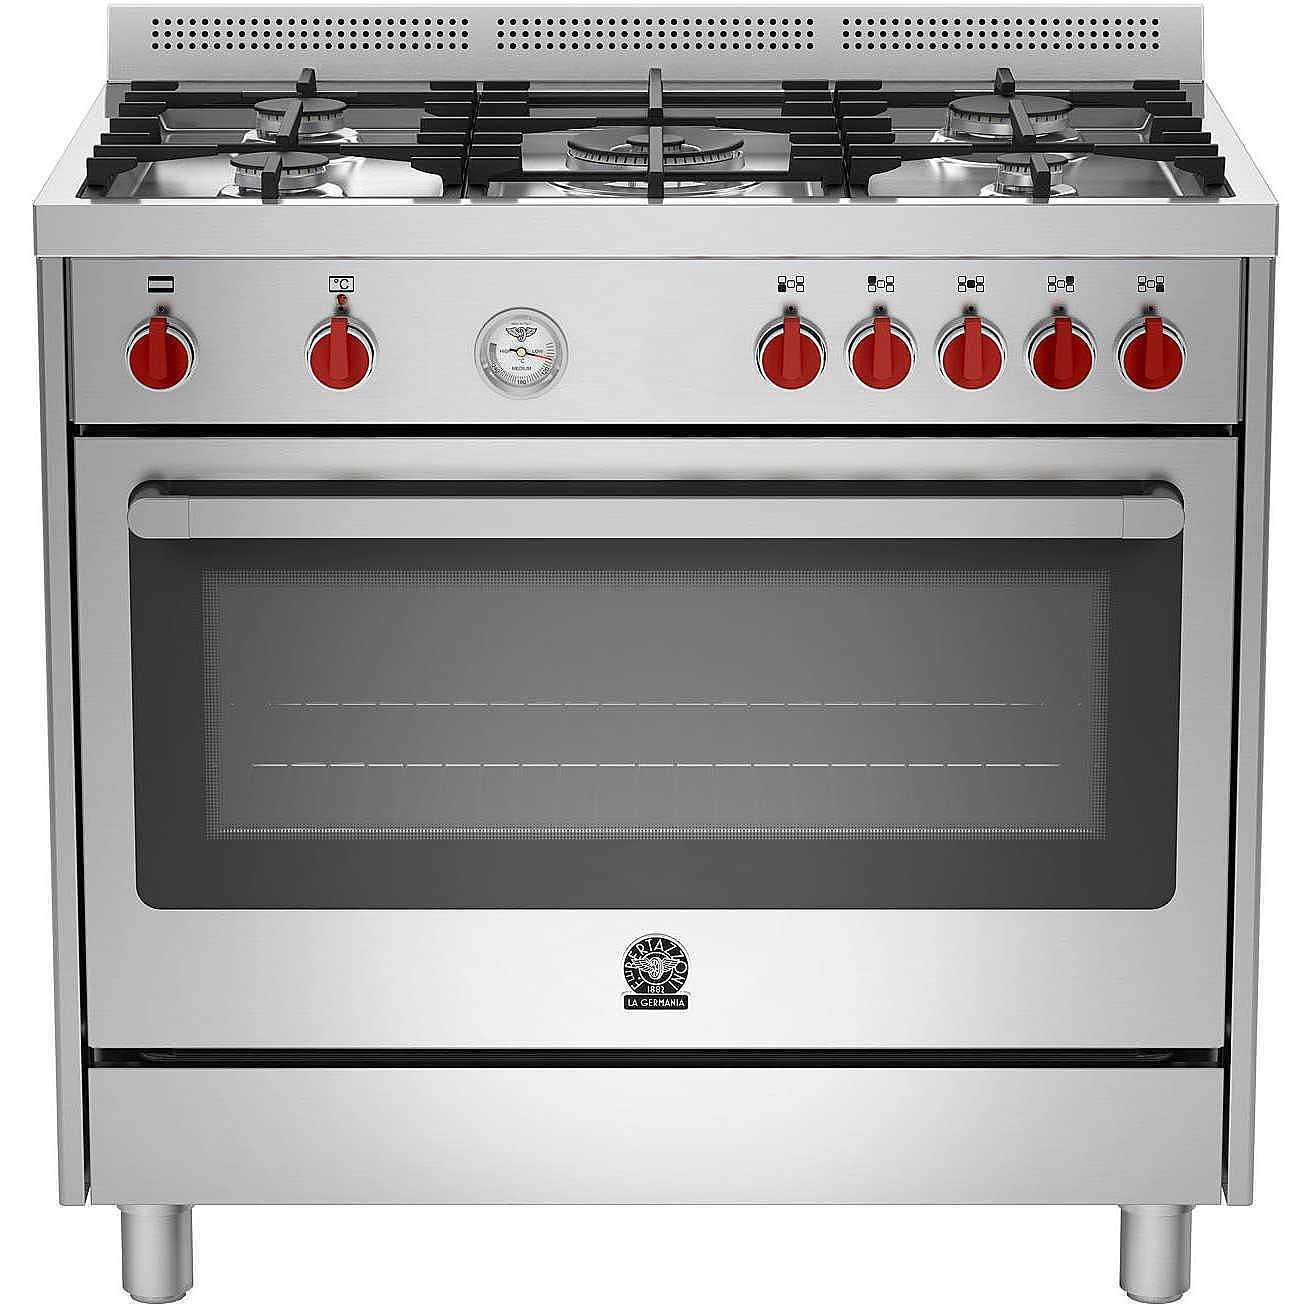 La Germania Prm965ext Cucina 90x60 5 Fuochi A Gas Forno Elettrico 85 L Classe A Colore Acciaio Inox Cucine Cucina 5 Fuochi Clickforshop